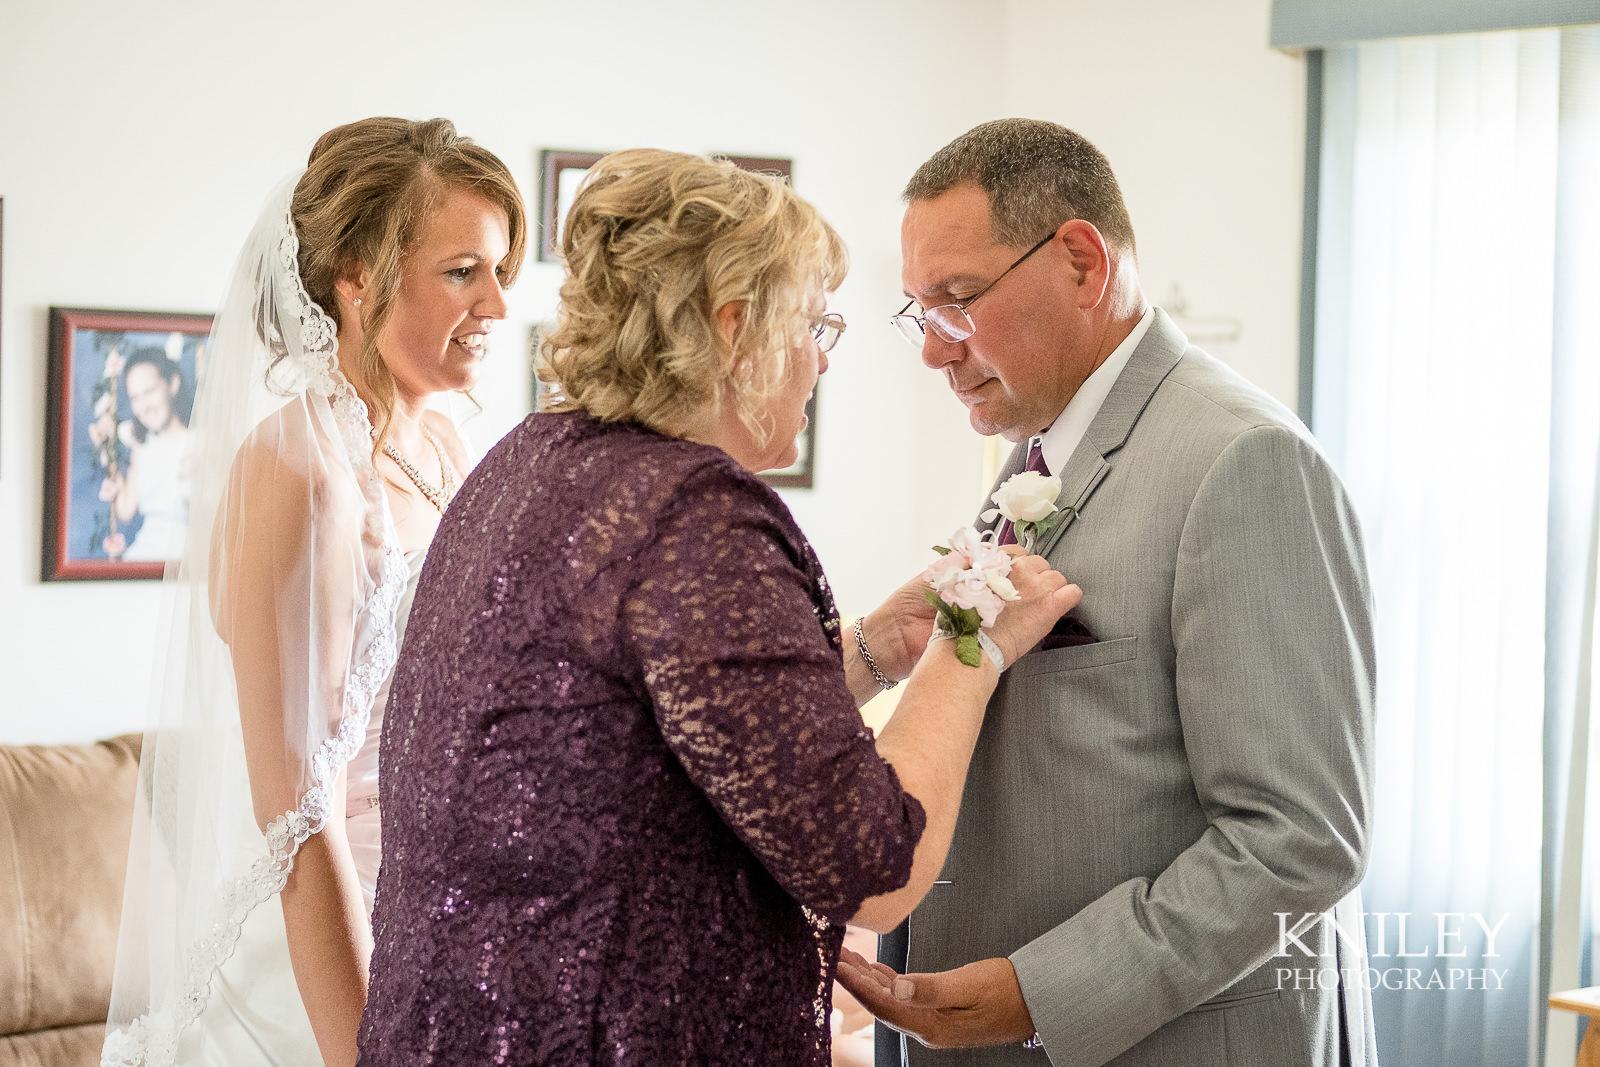 031 - St Josephs Park Wedding Picture - Rochester NY - XT2A0281.jpg